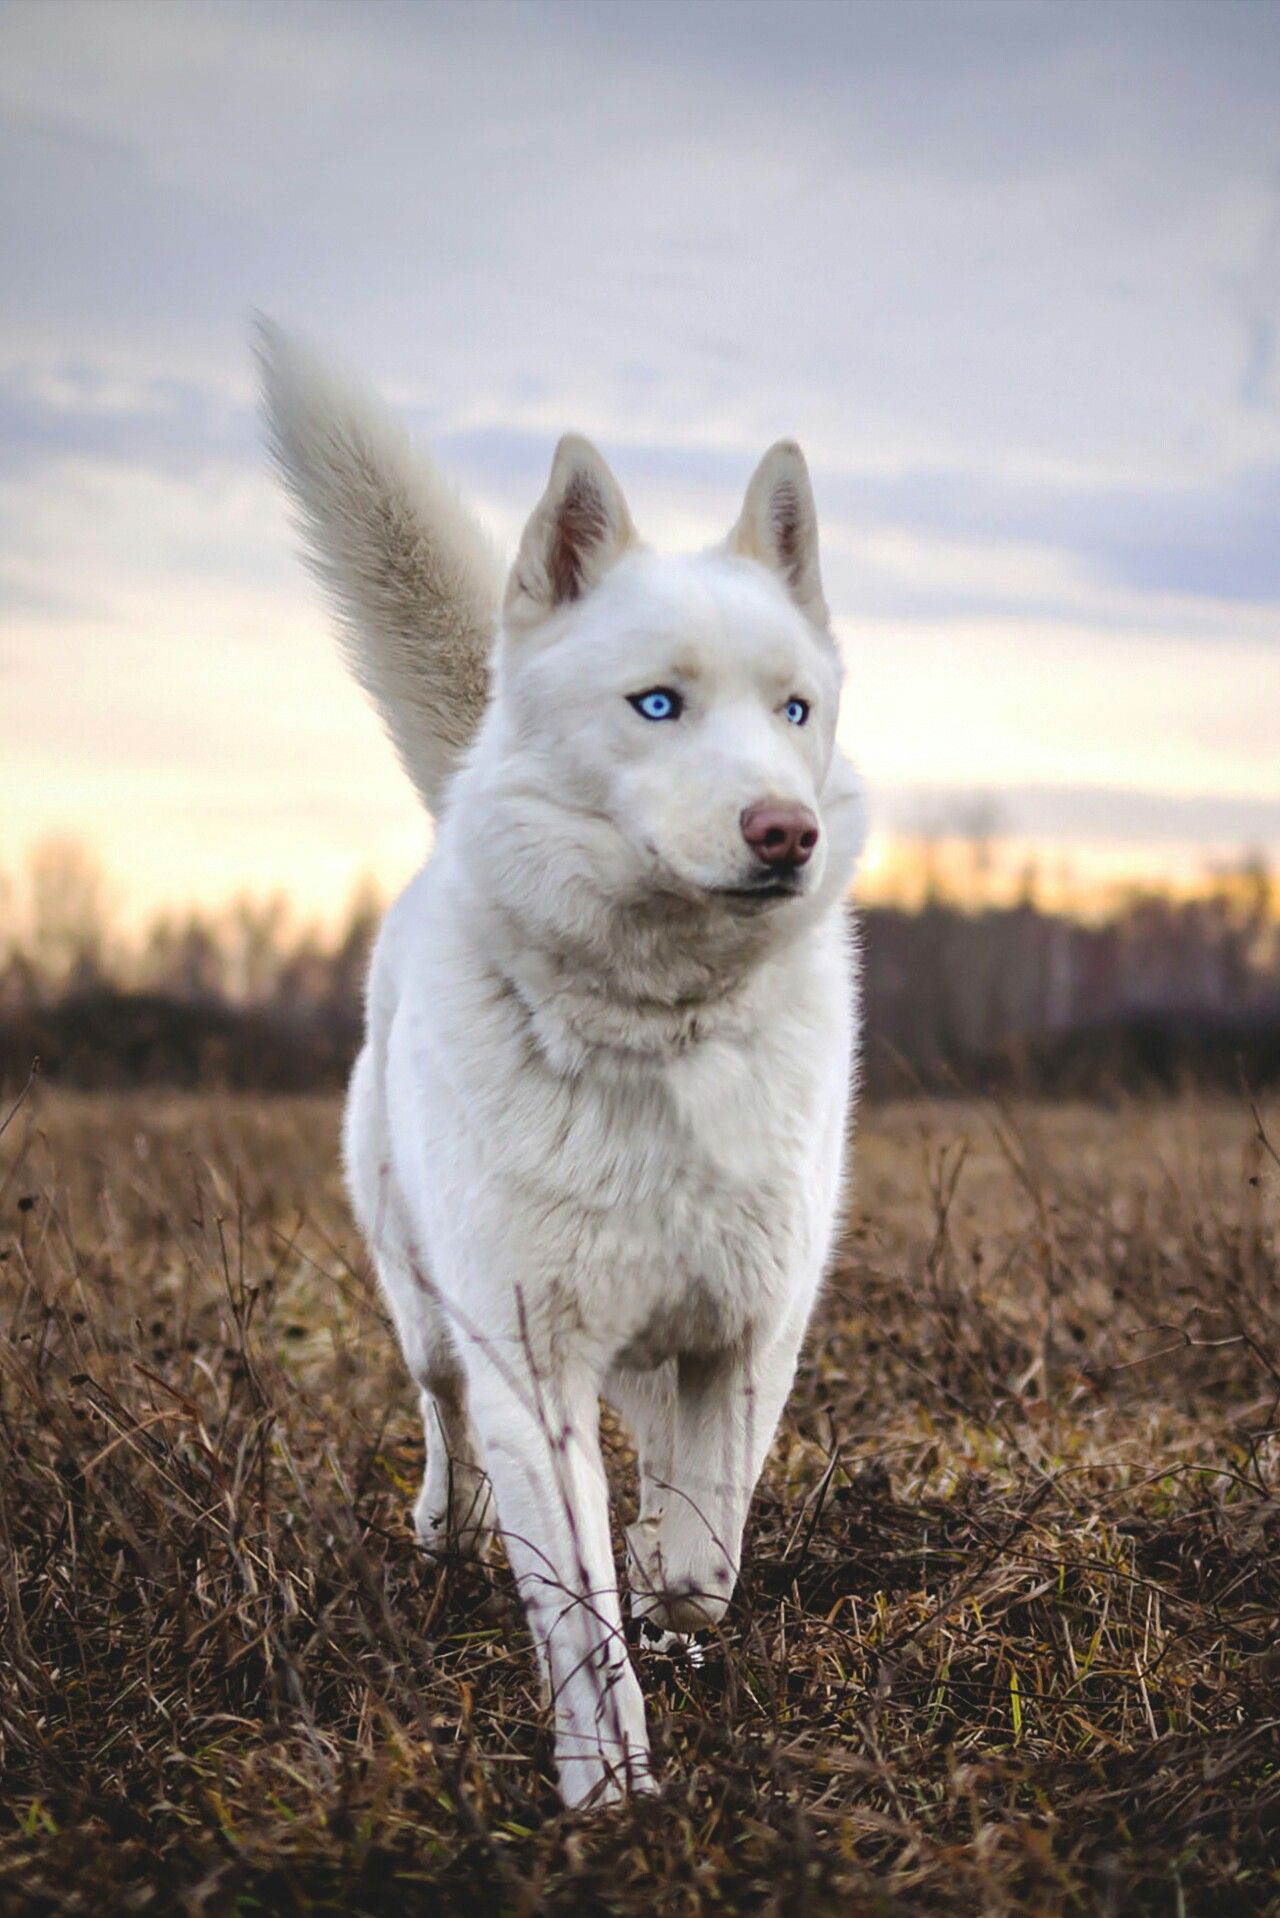 Star★™ | White siberian husky, Husky puppy, Siberian husky dog